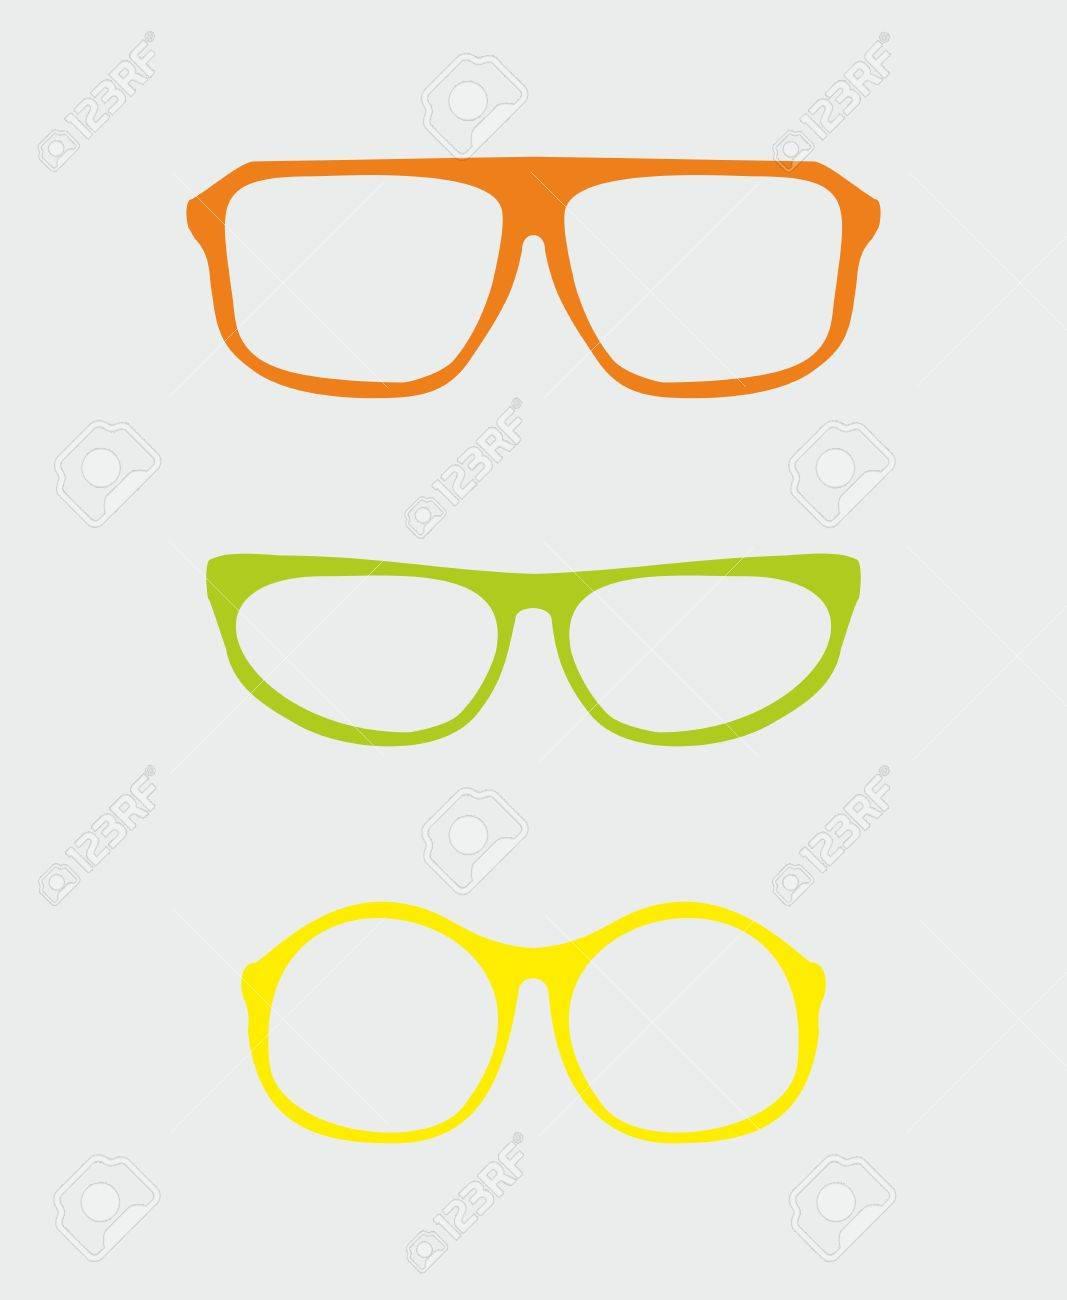 Bunte Vektor Gläser Mit Orange Rot, Grün, Gelb Halter Retro Hipster ...